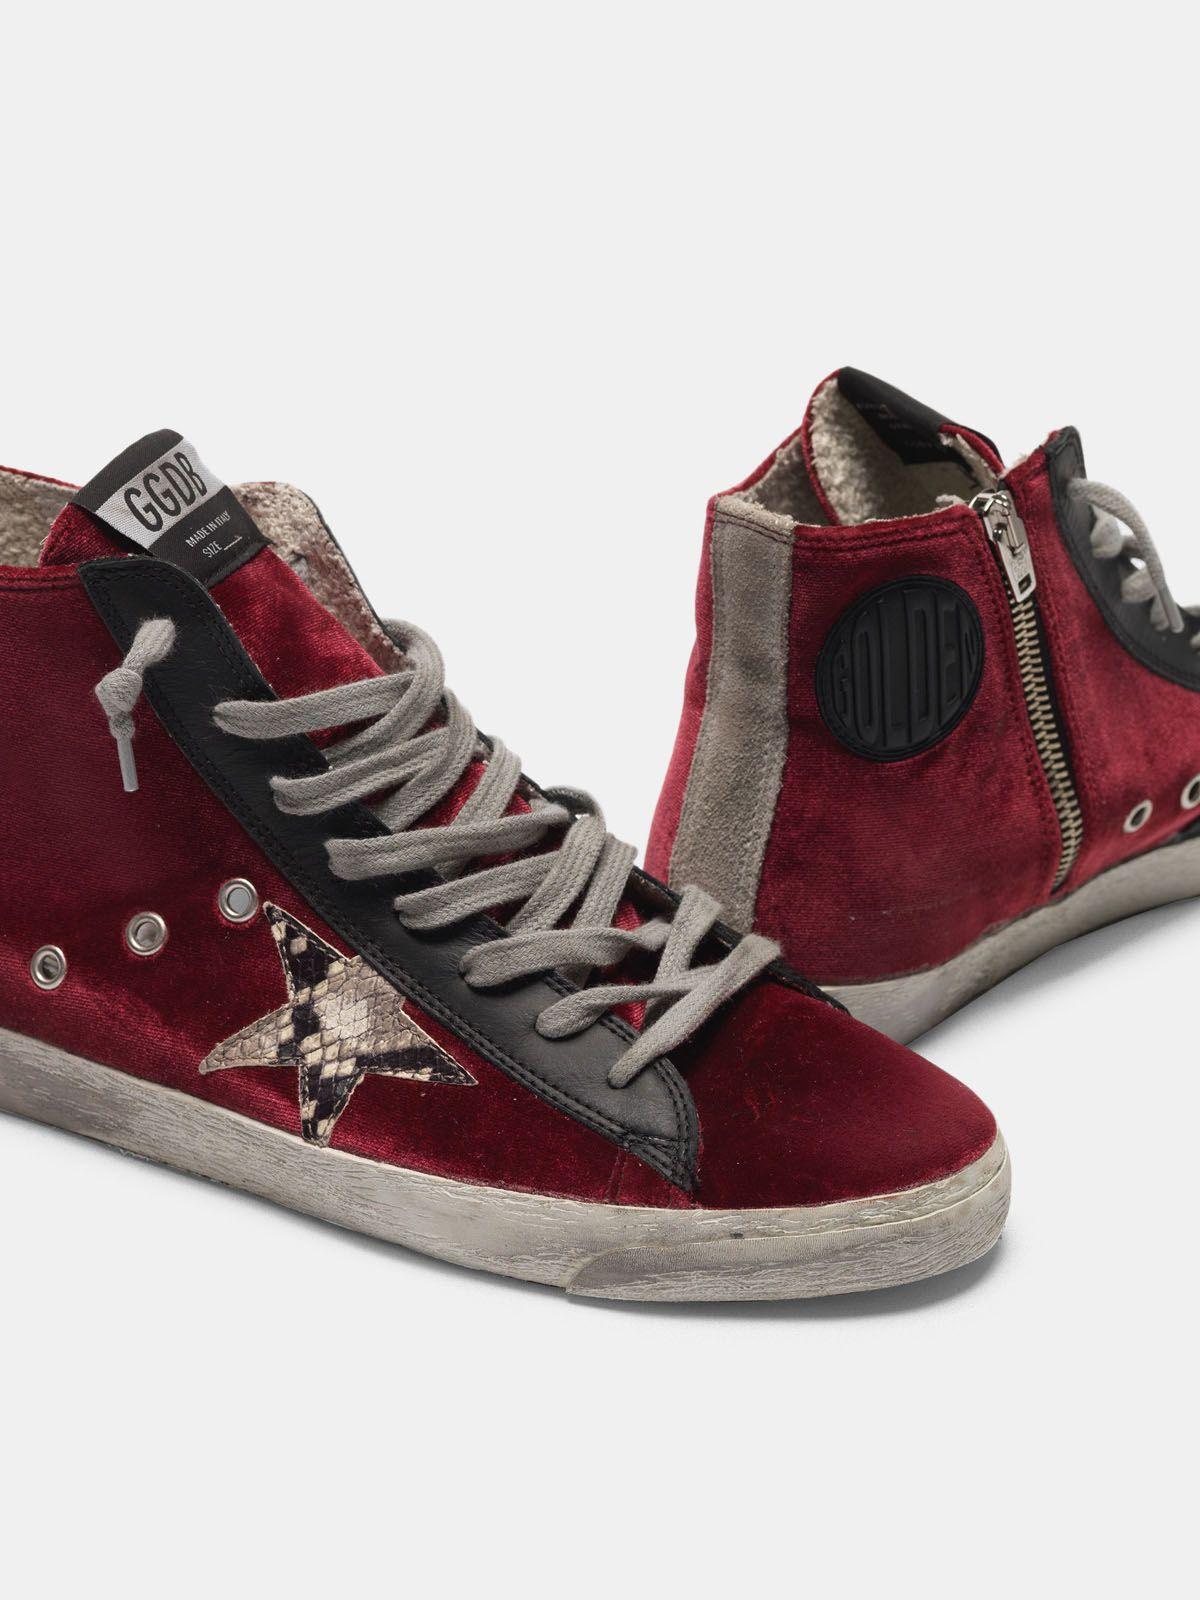 Golden Goose - Francy sneakers in velvet with snake-print star in